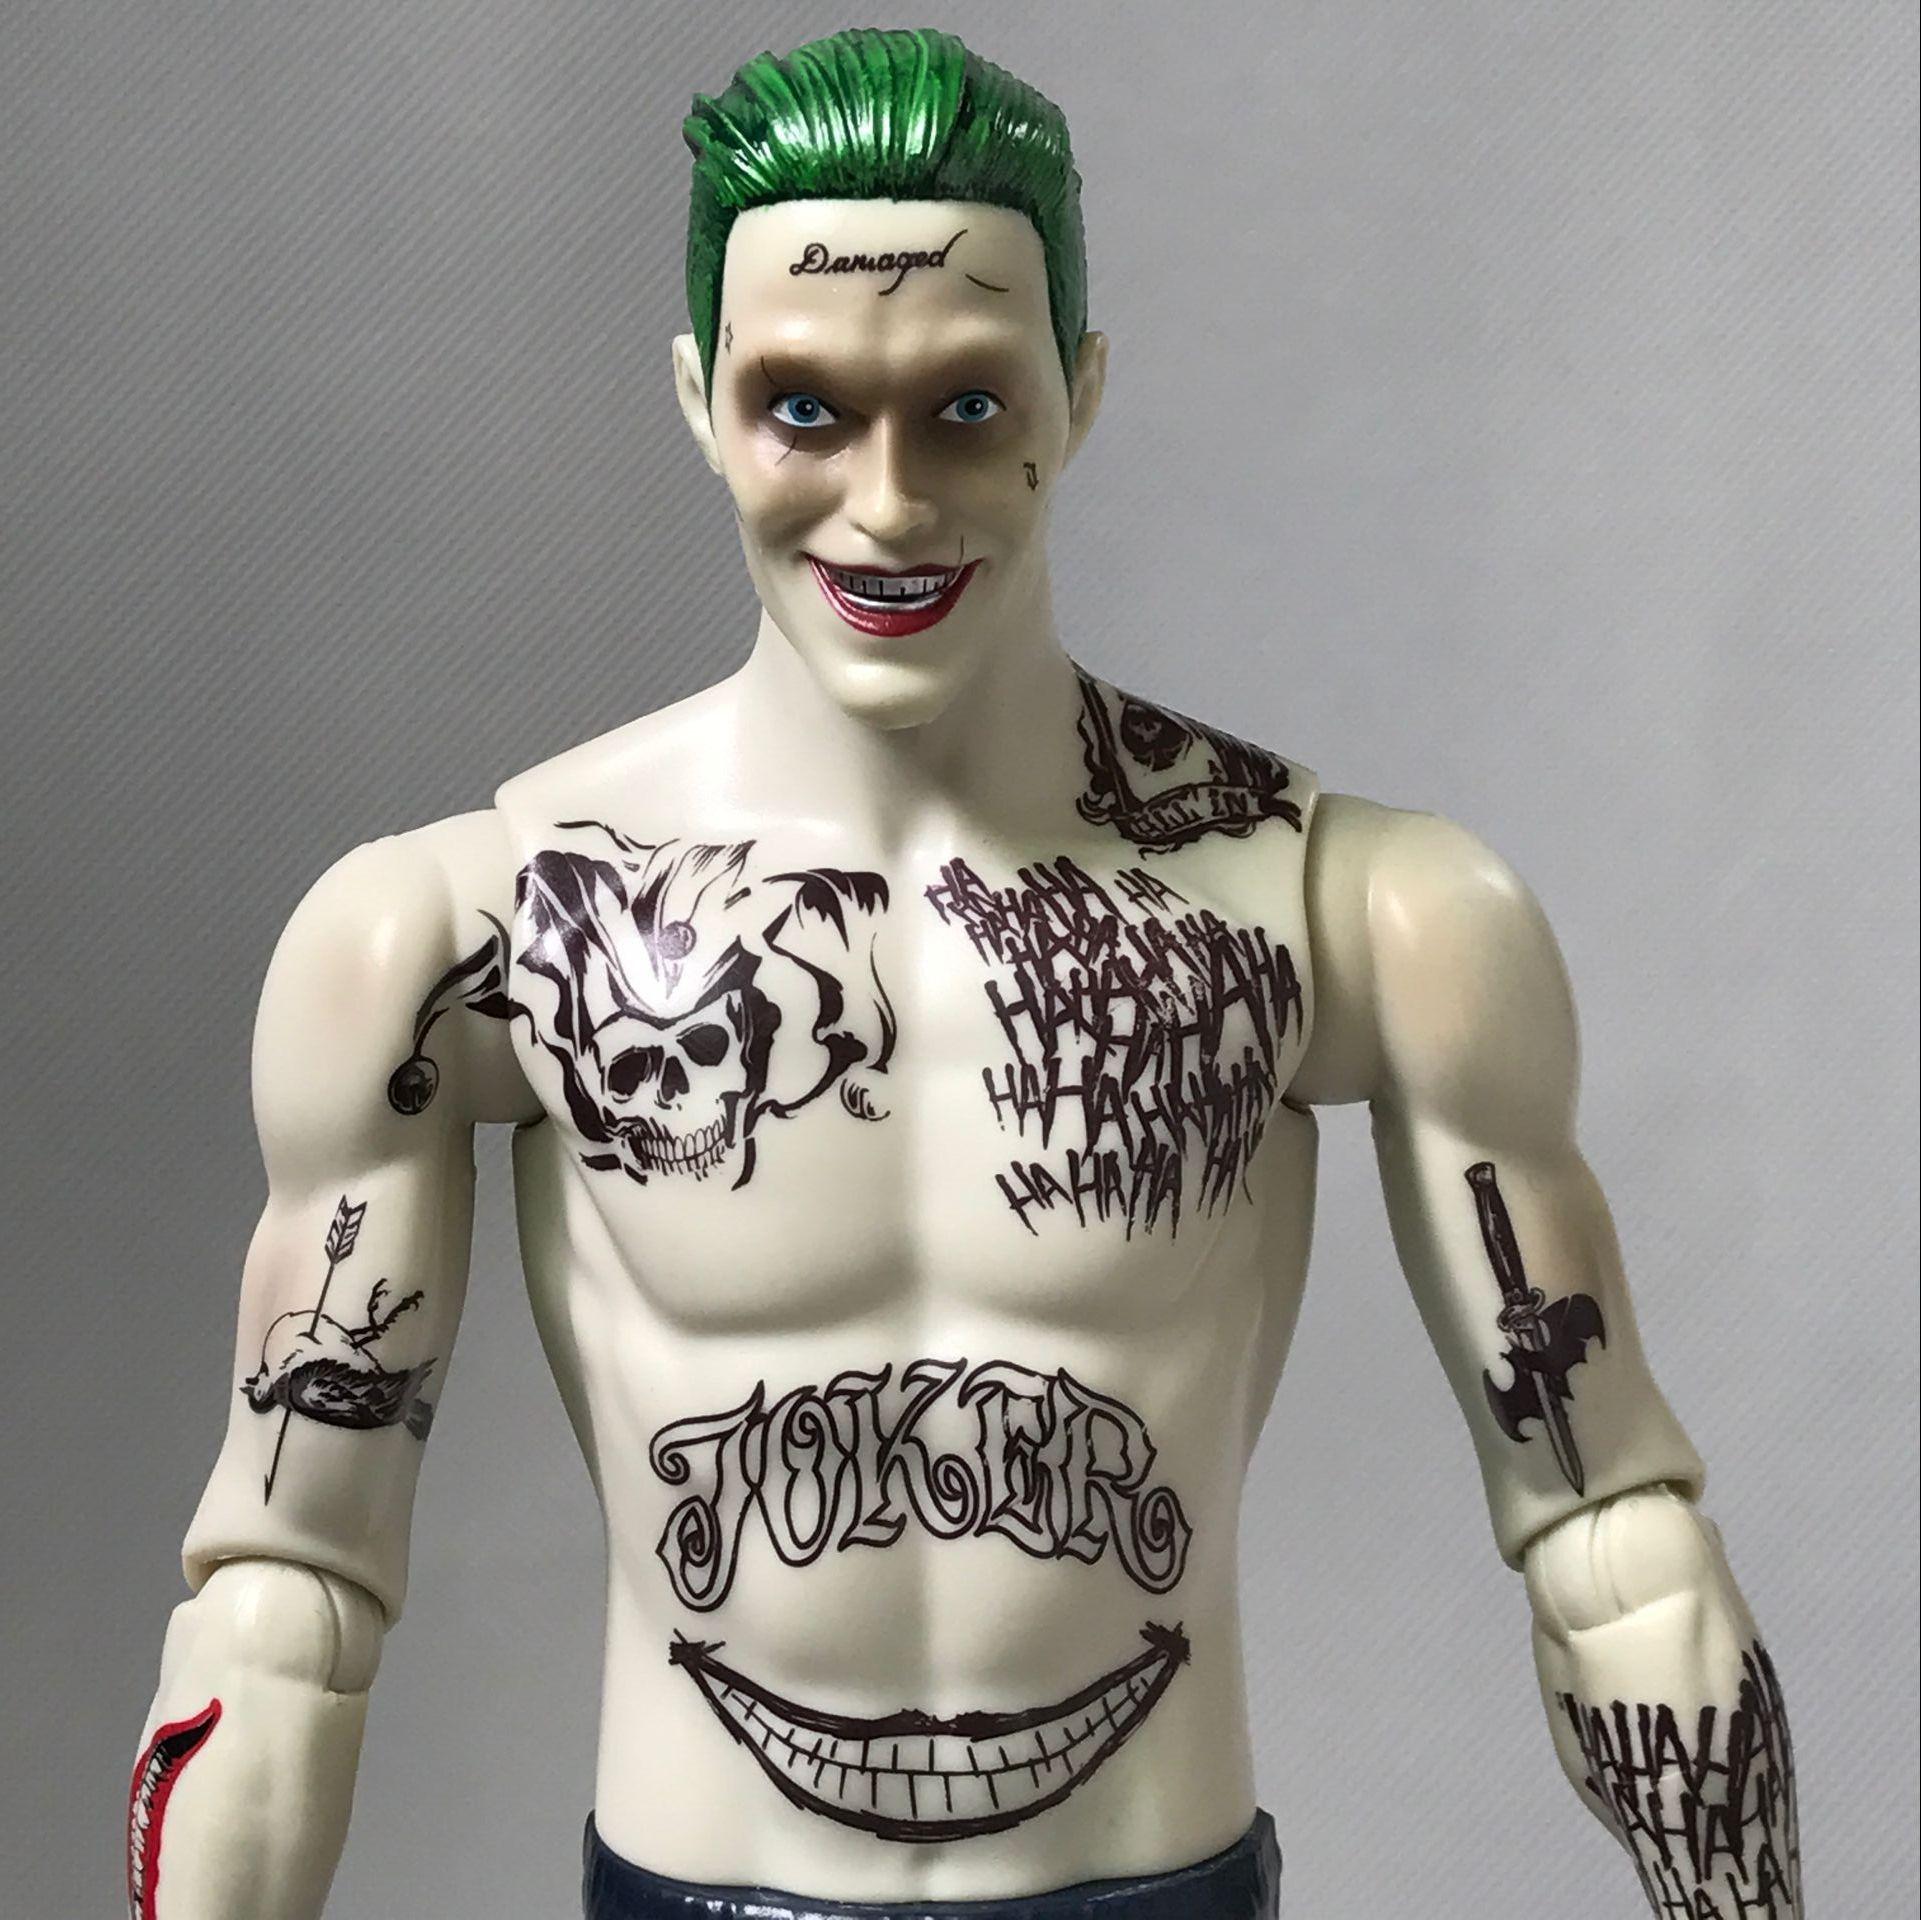 Crazy Toys 12 30cm DC Suicide Squad Joker Character BJD Joint Move Action Figure Toys